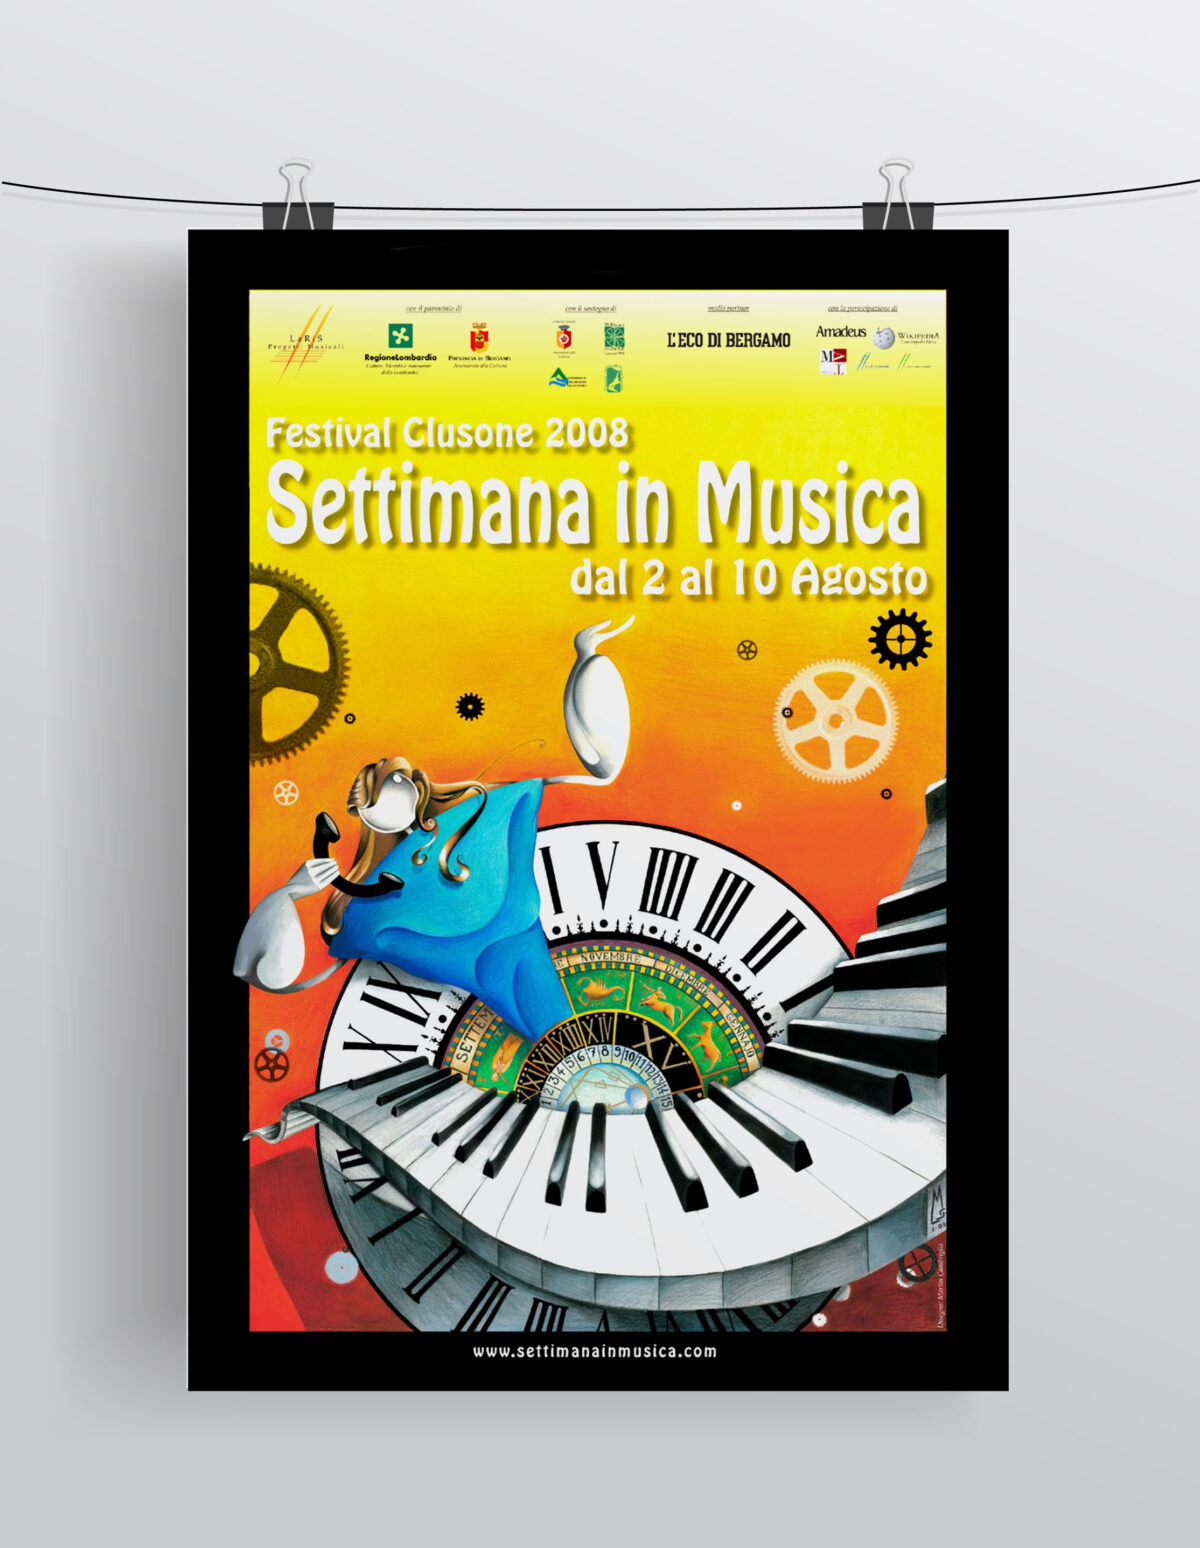 Settimana in Musica - Locandina 2008